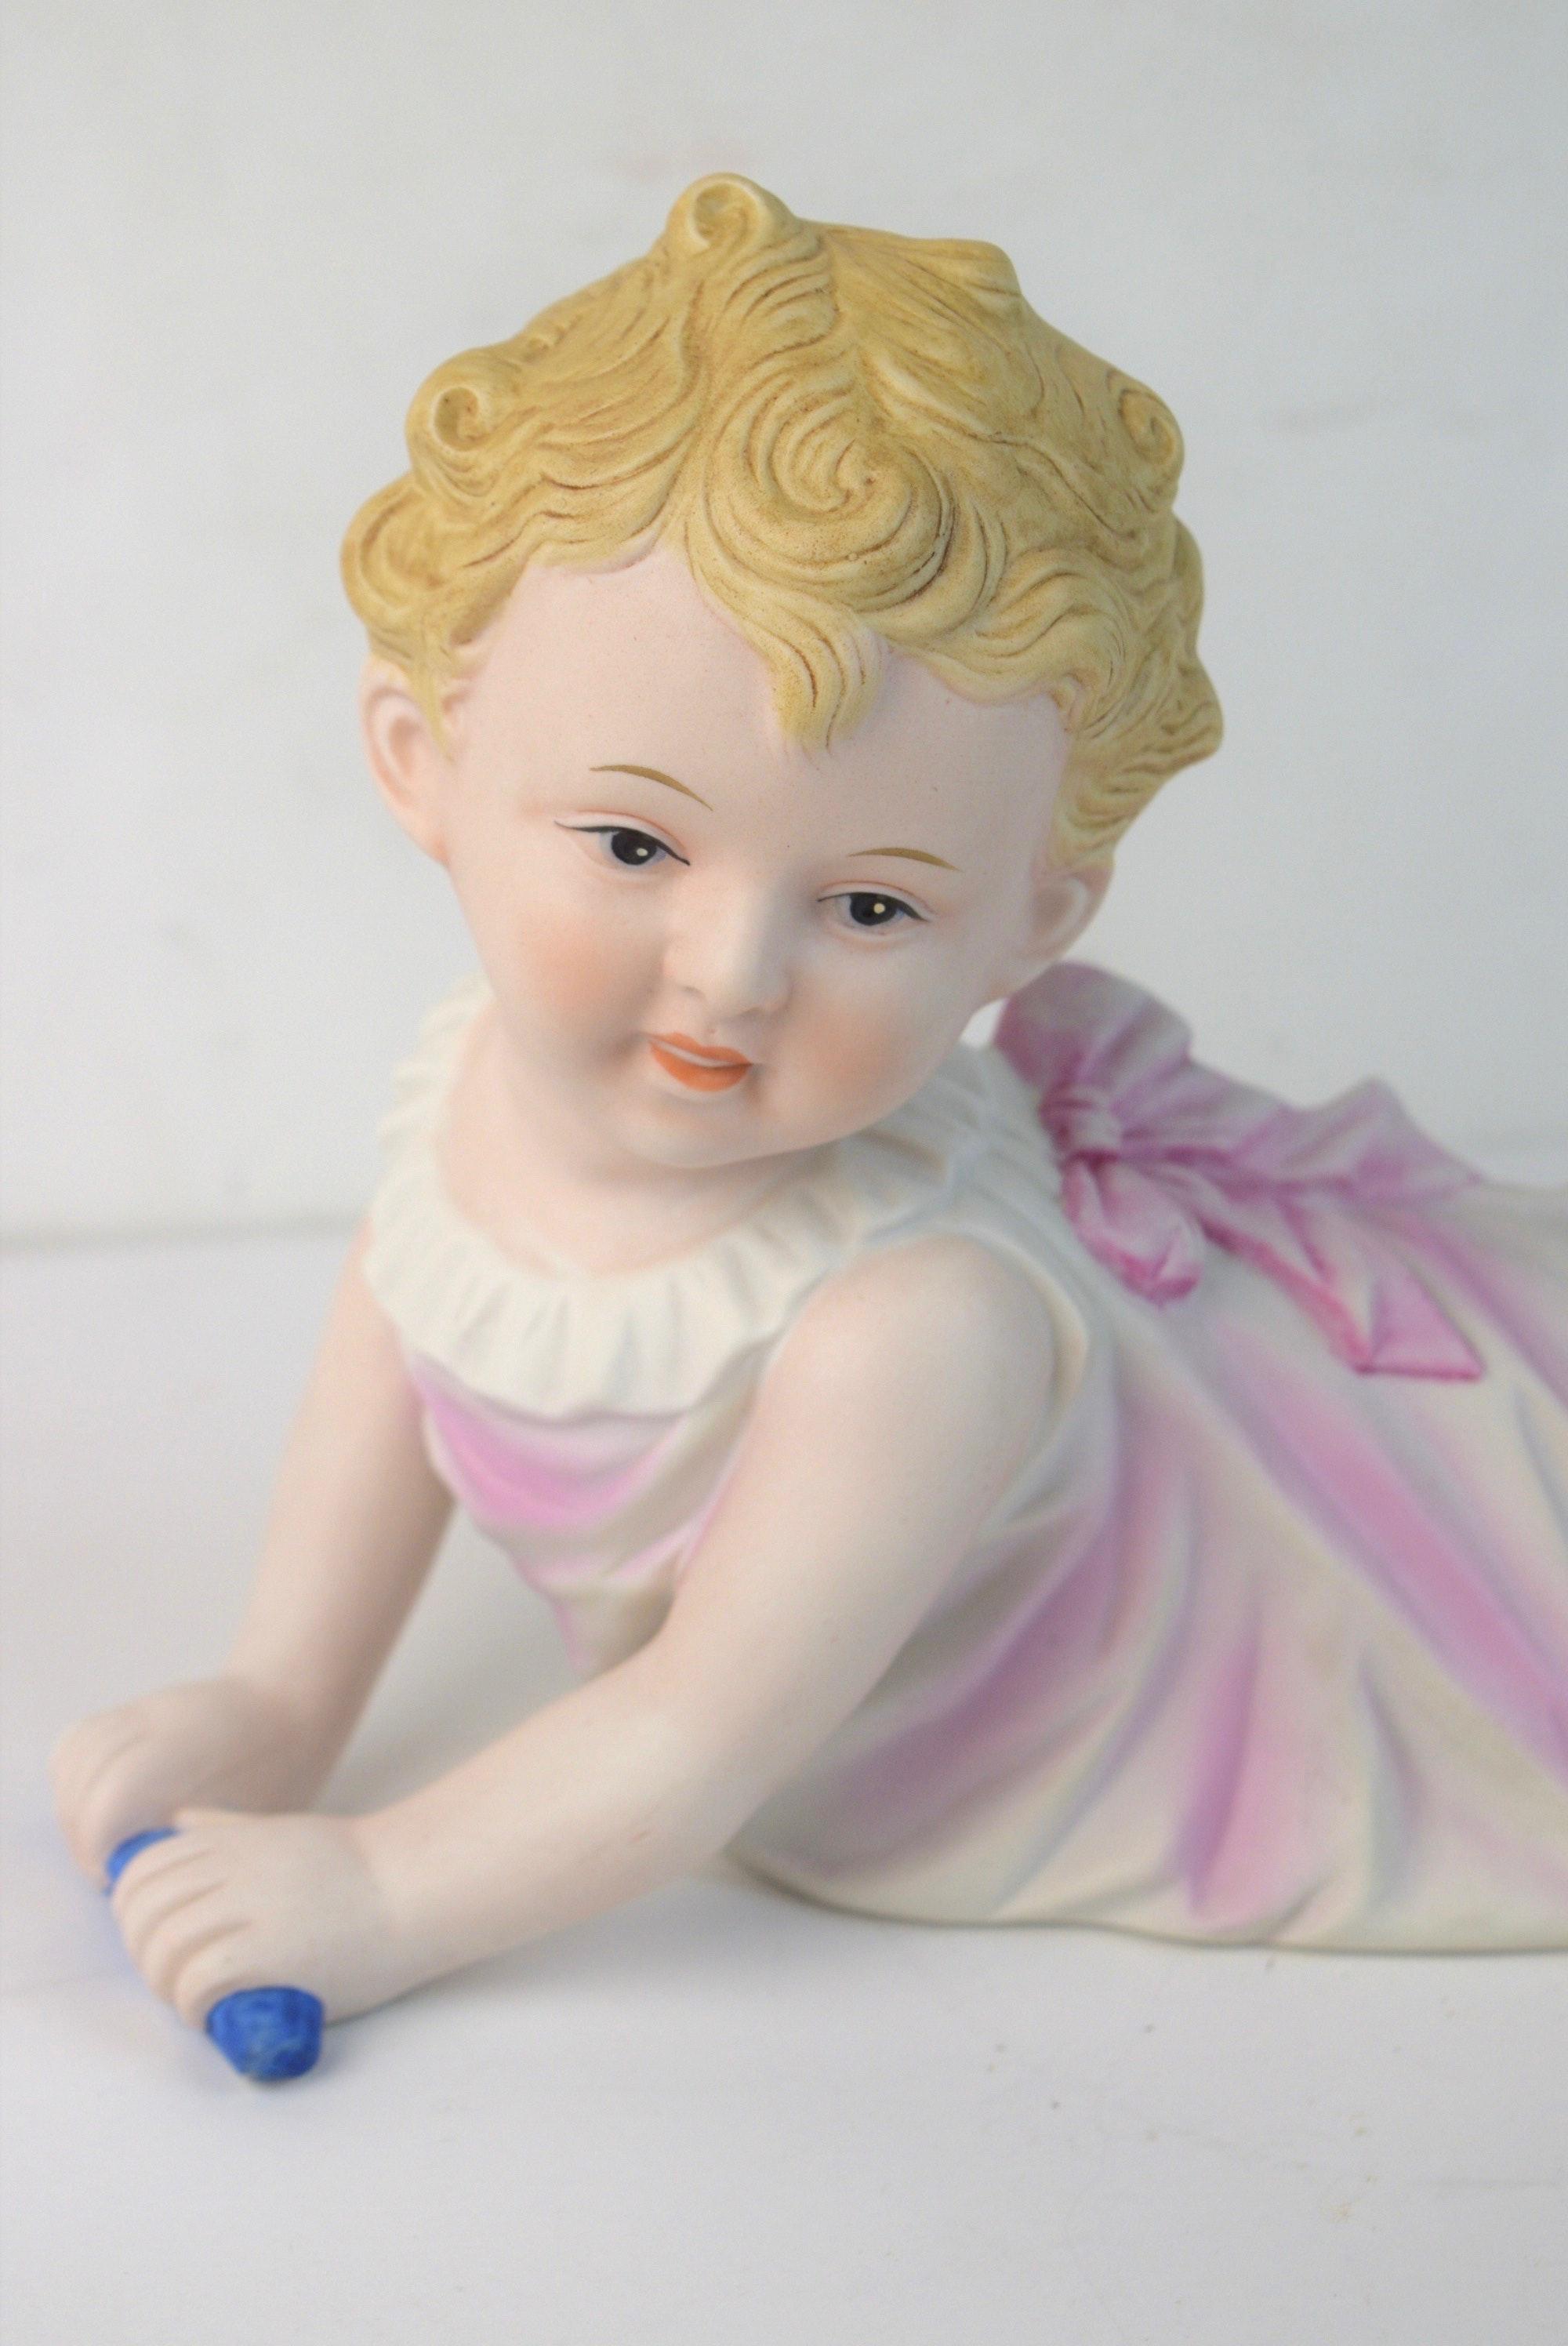 Piano Baby Bisque Figurine Ebth